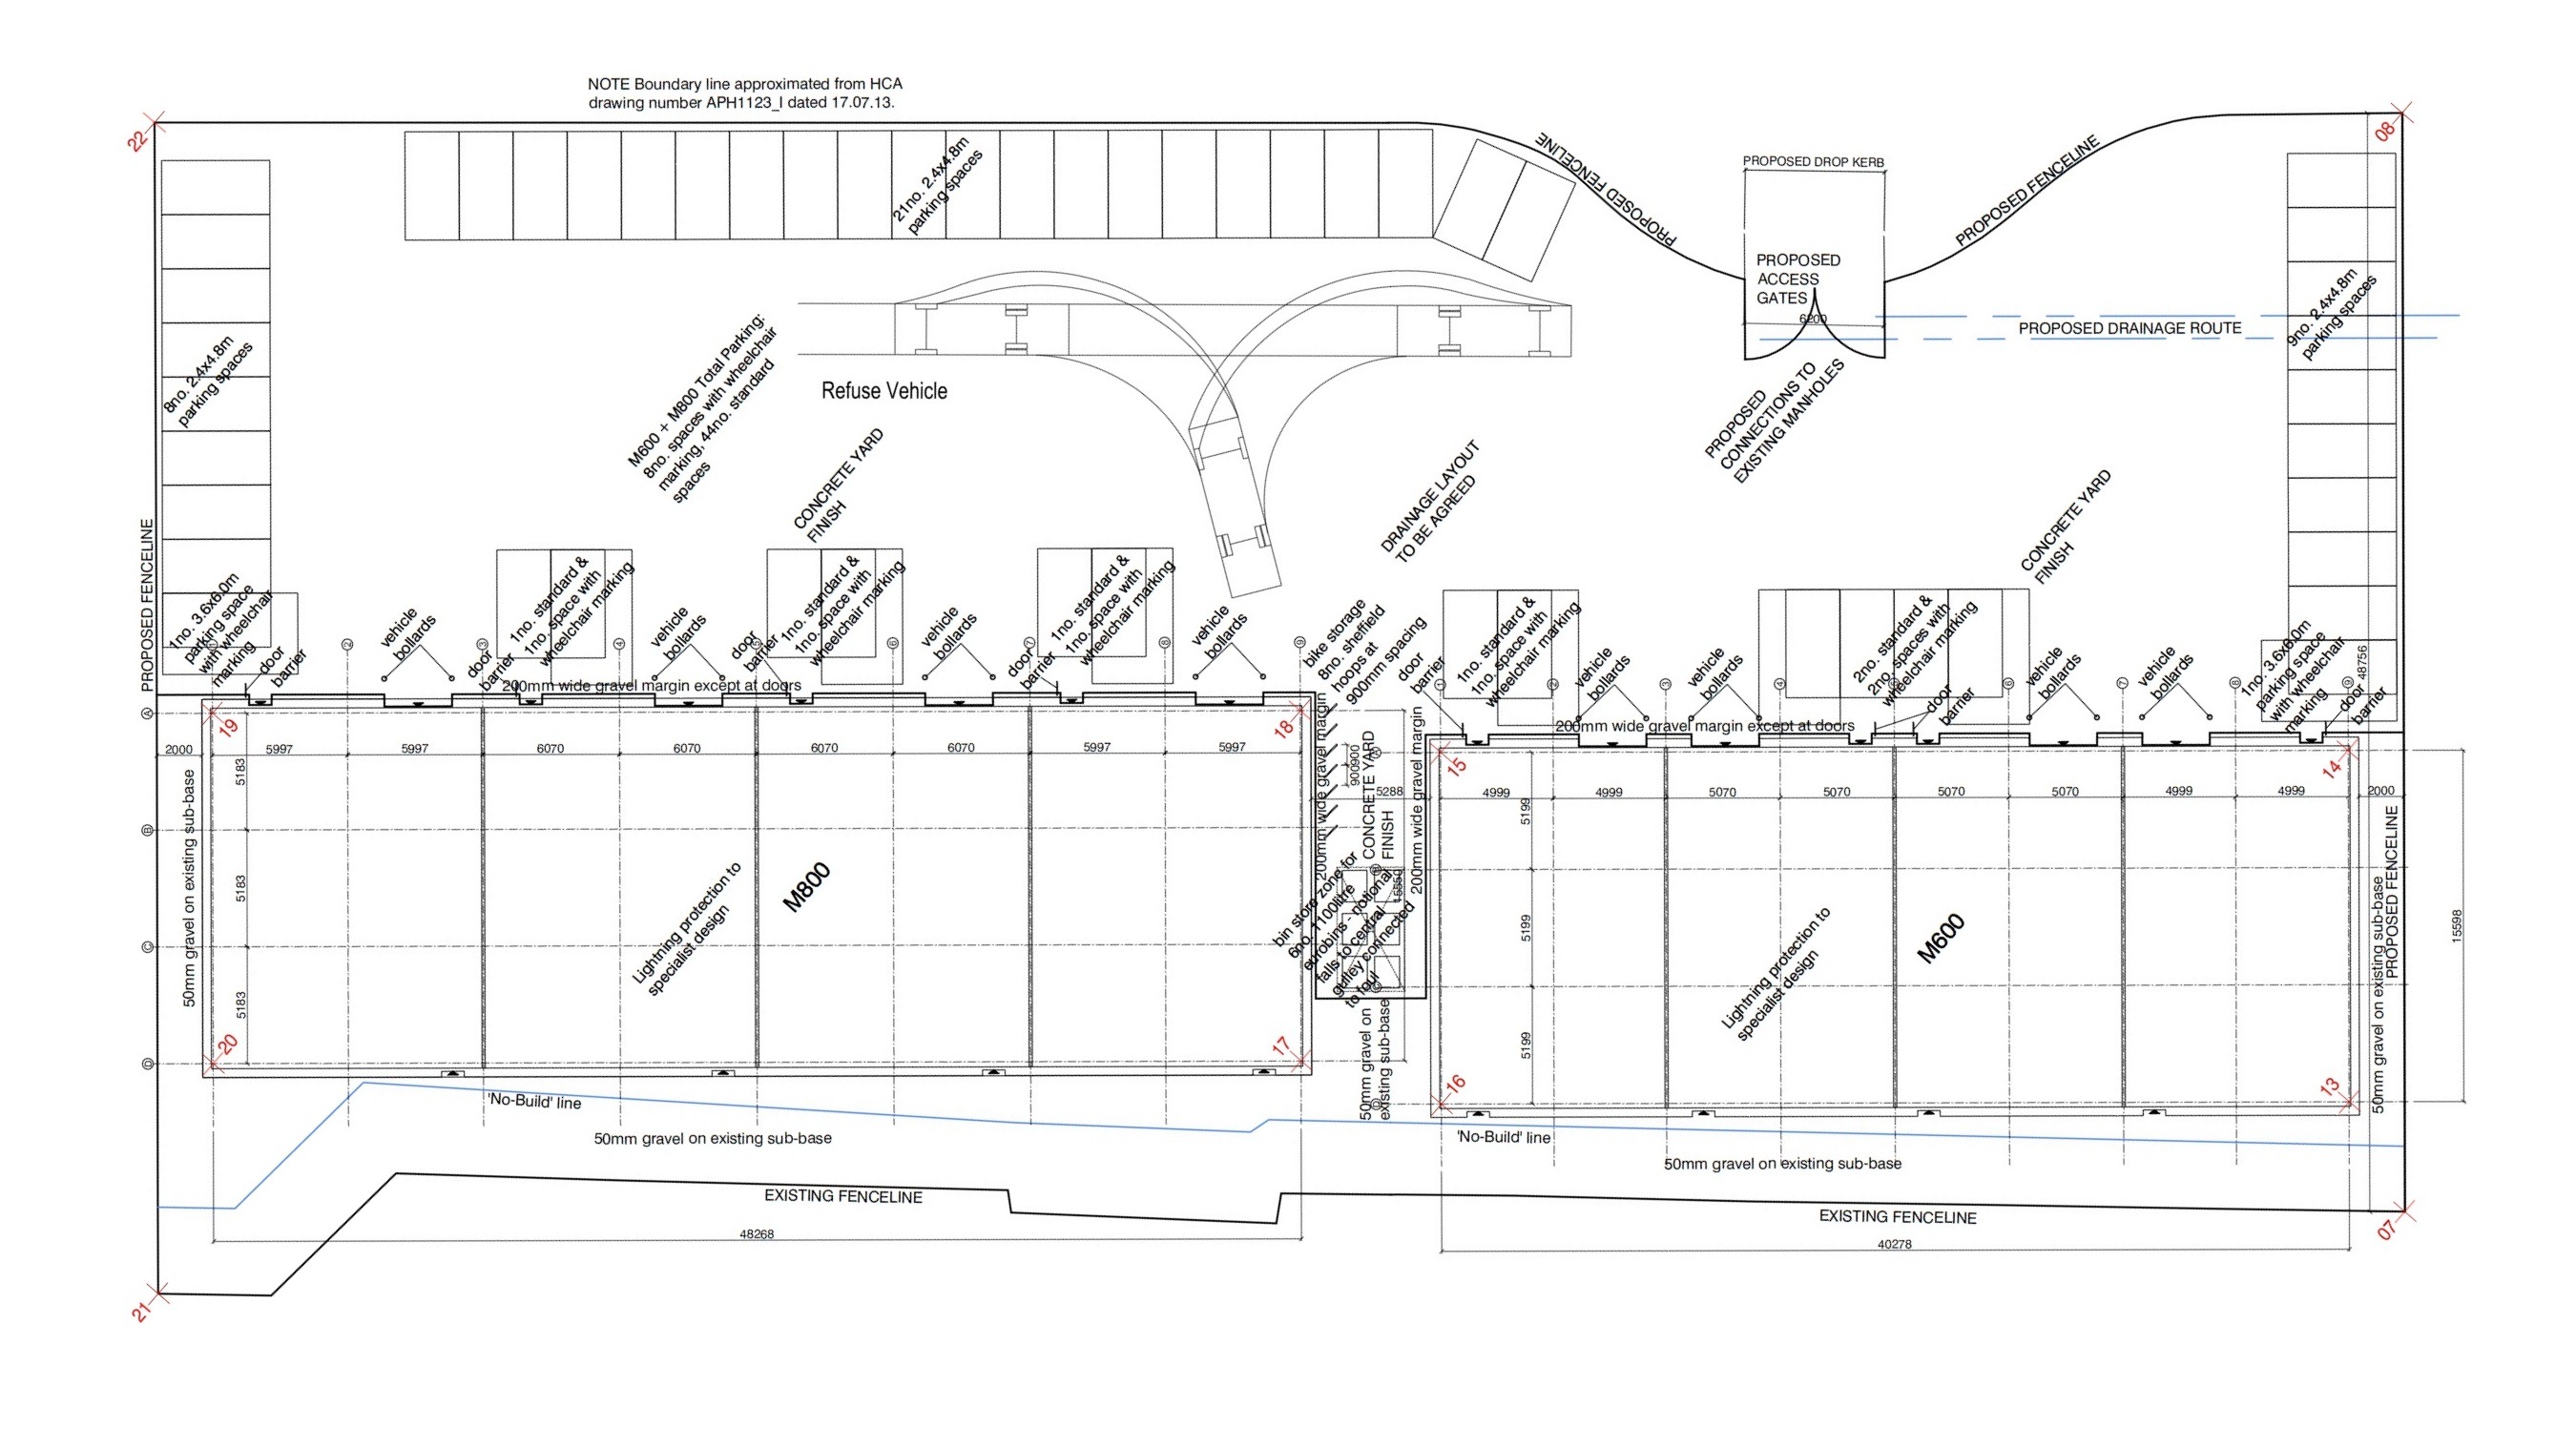 0137-8-SP01-02 Site Plan